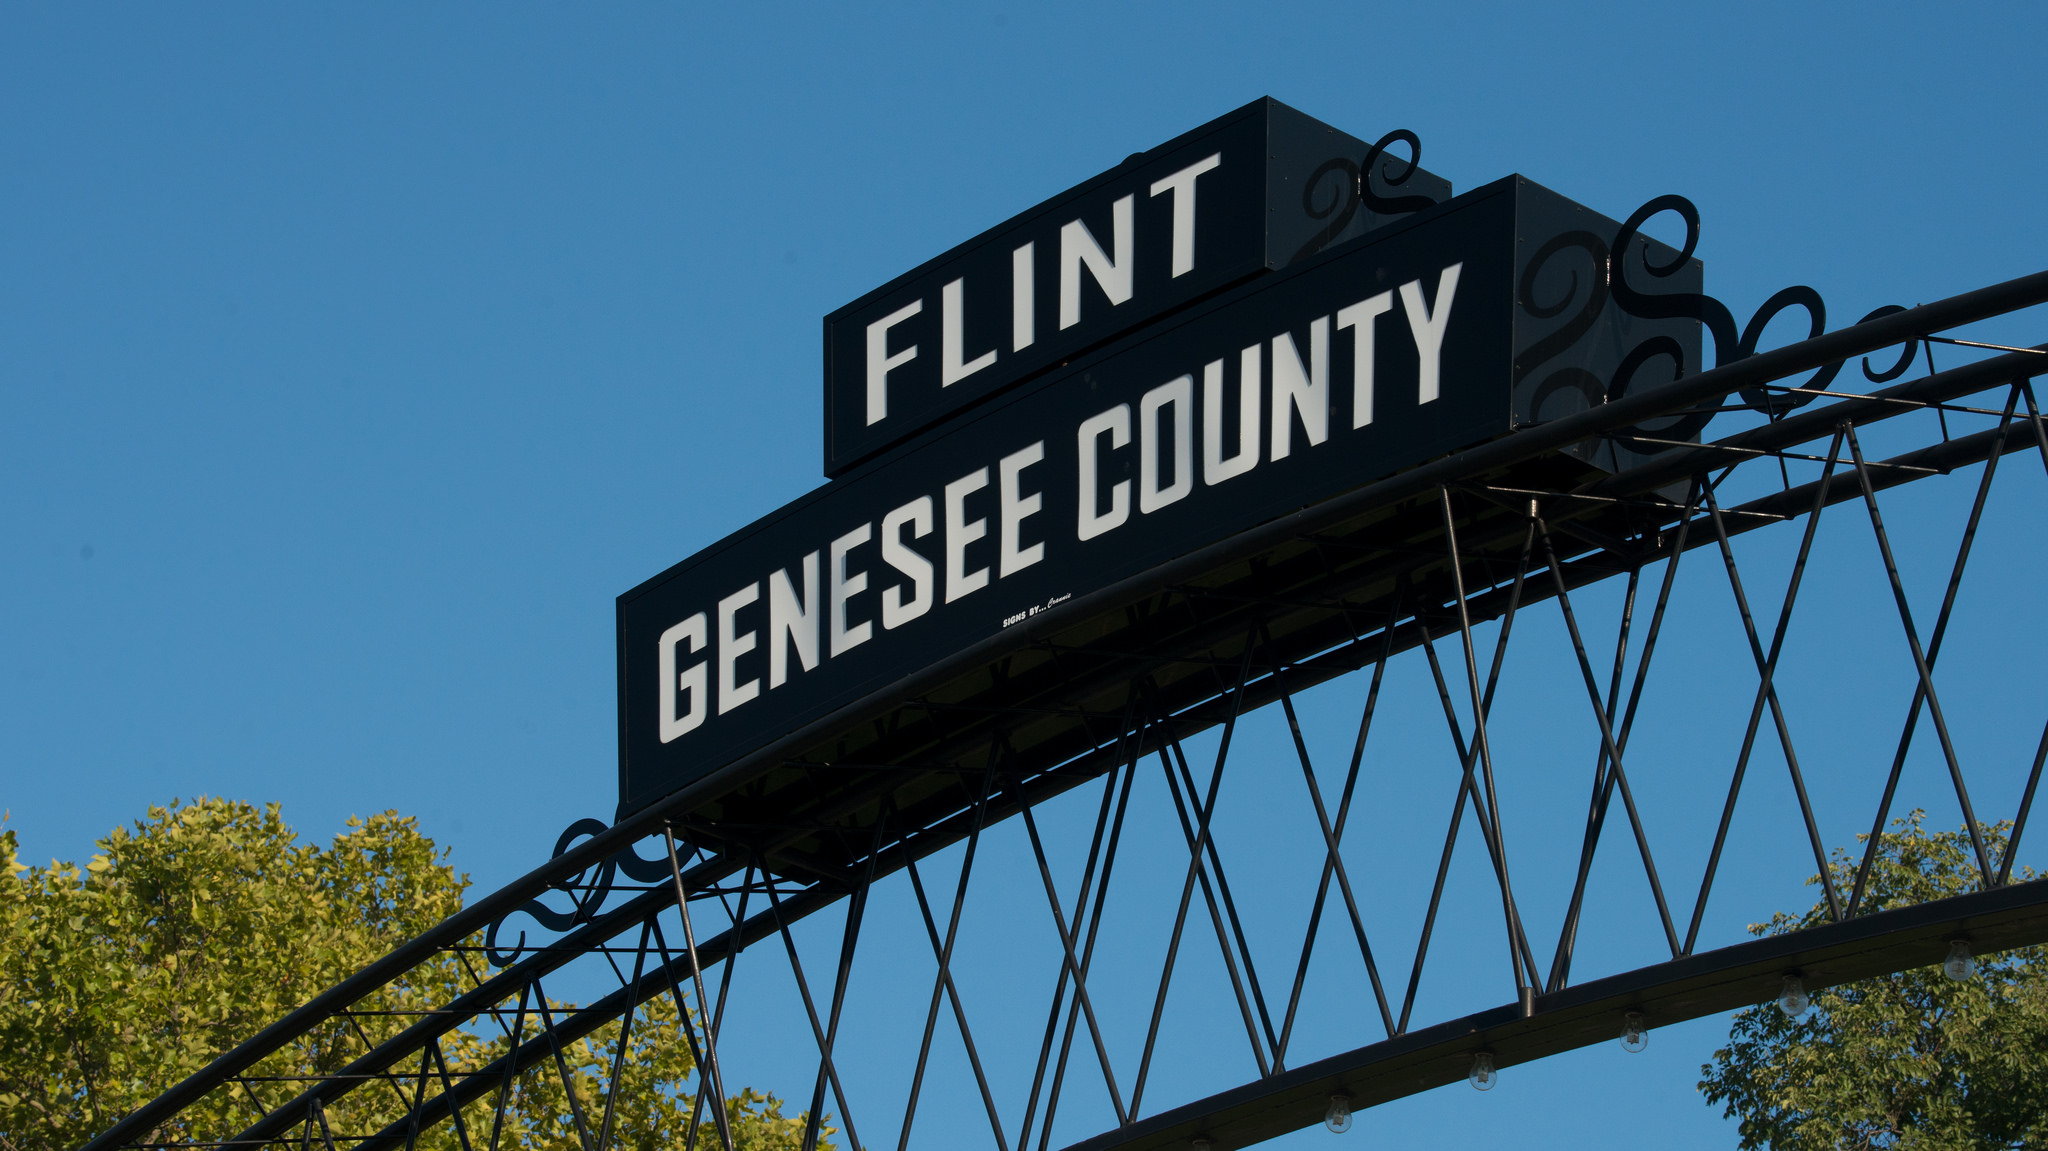 Best Flint Truck Accident Lawyer